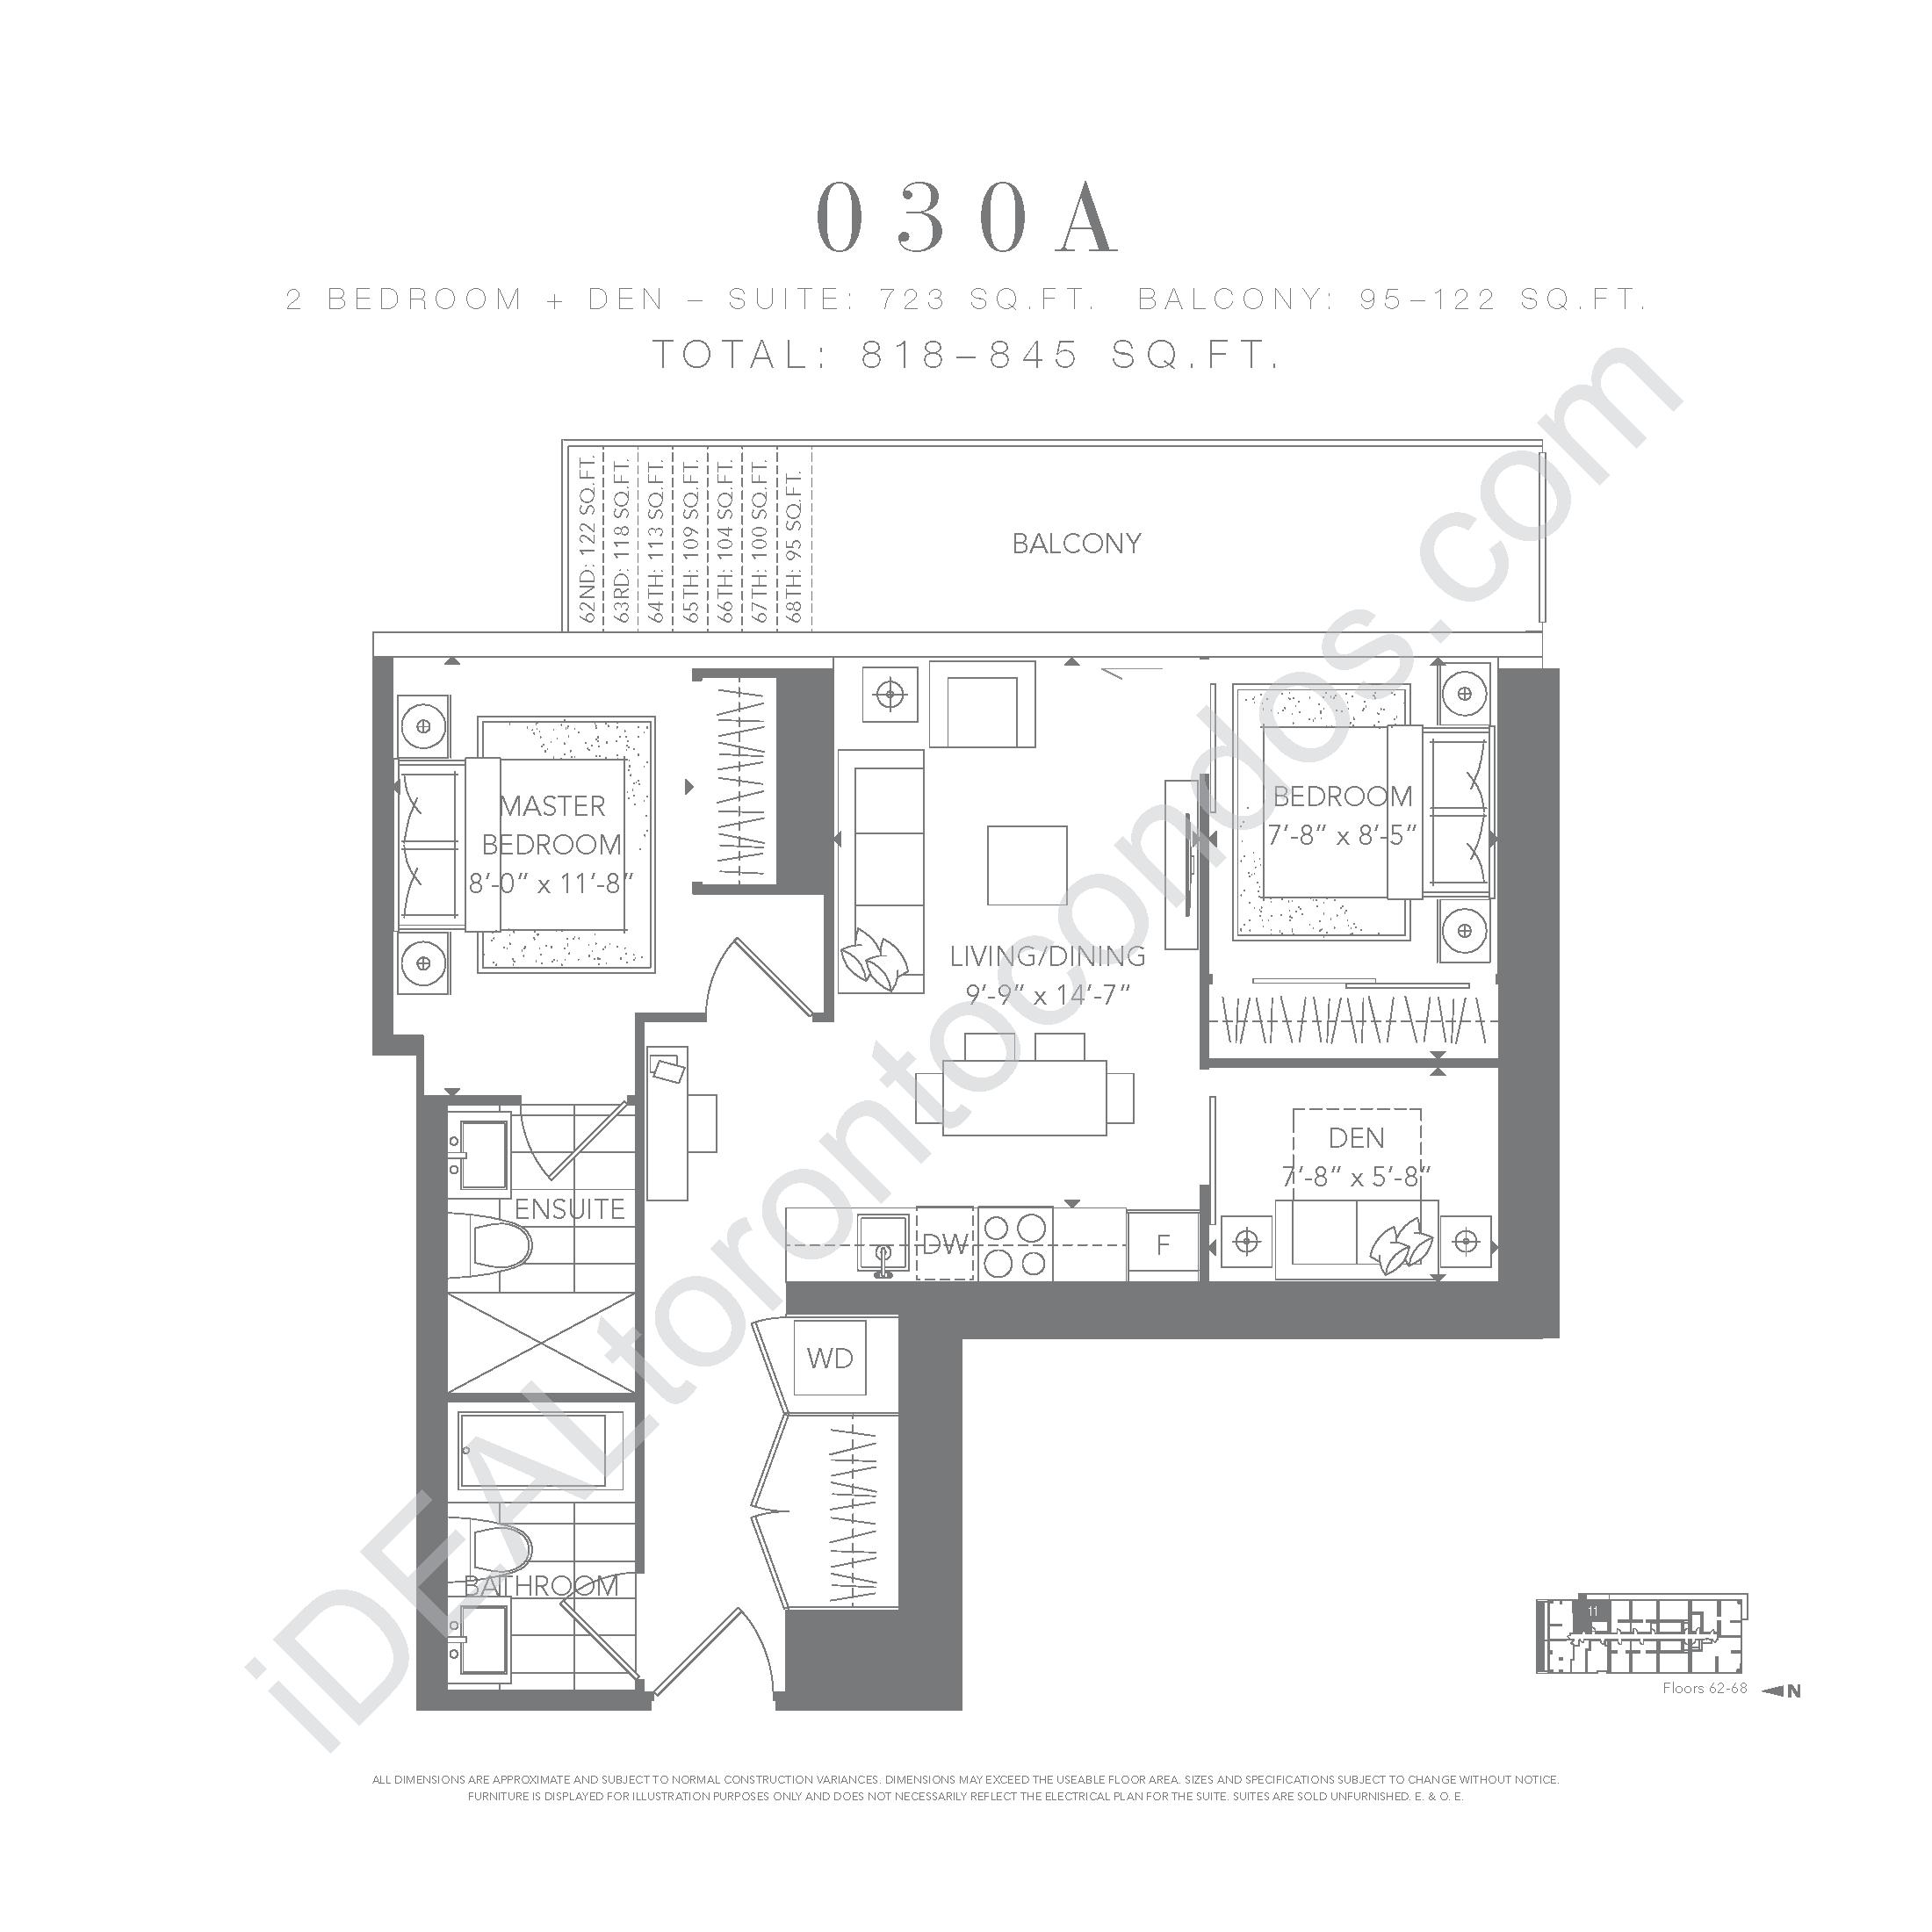 2 bedroom 030 A